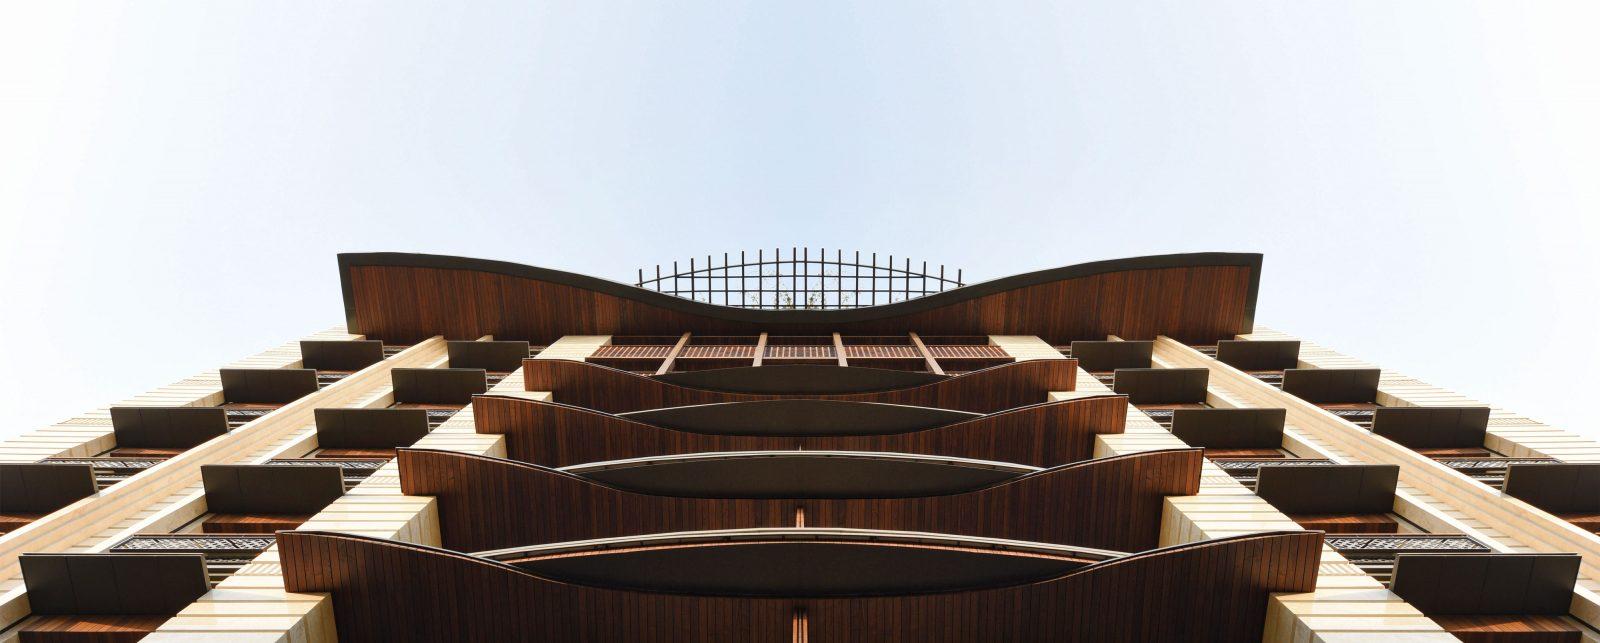 Cedrus Residential Building